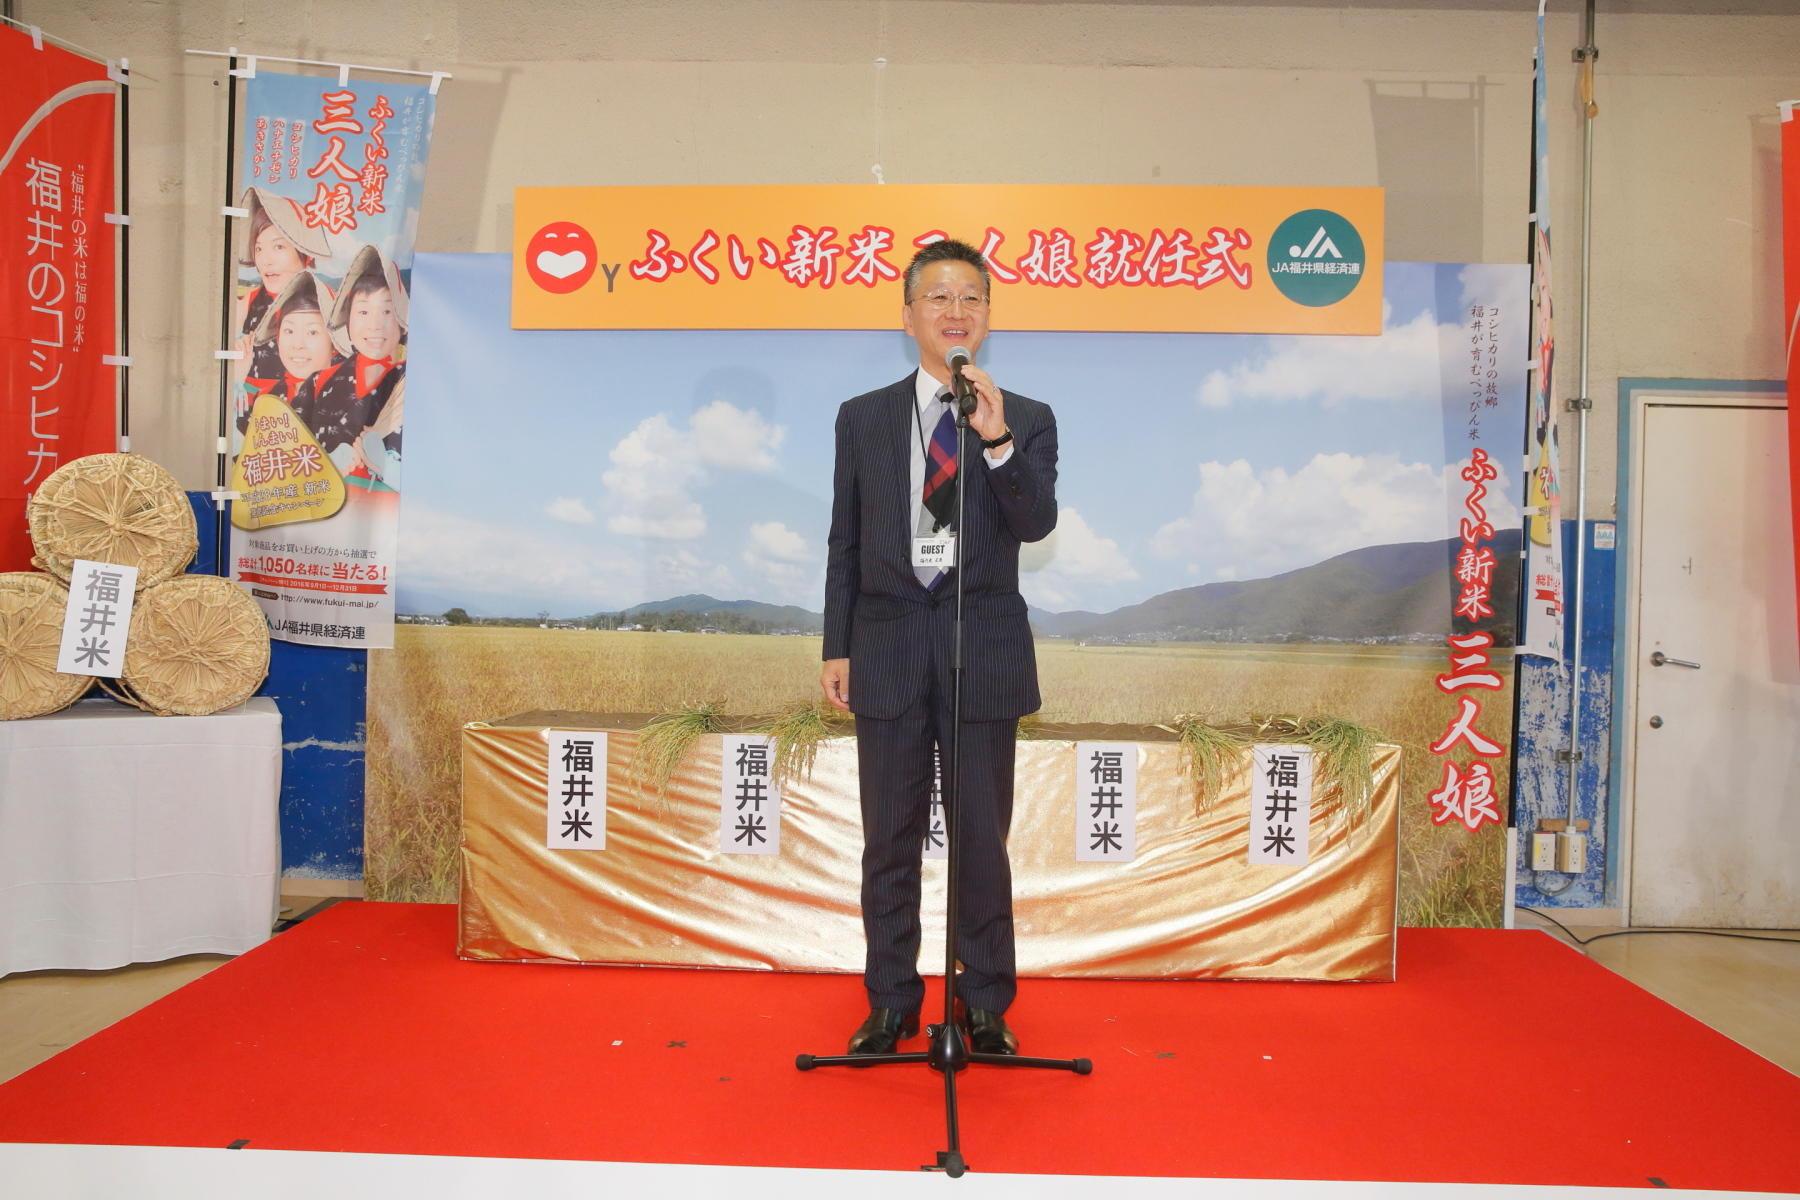 http://news.yoshimoto.co.jp/20160831144118-6110ee8e8037ee87633b49c289ea42c6abdcc499.jpg